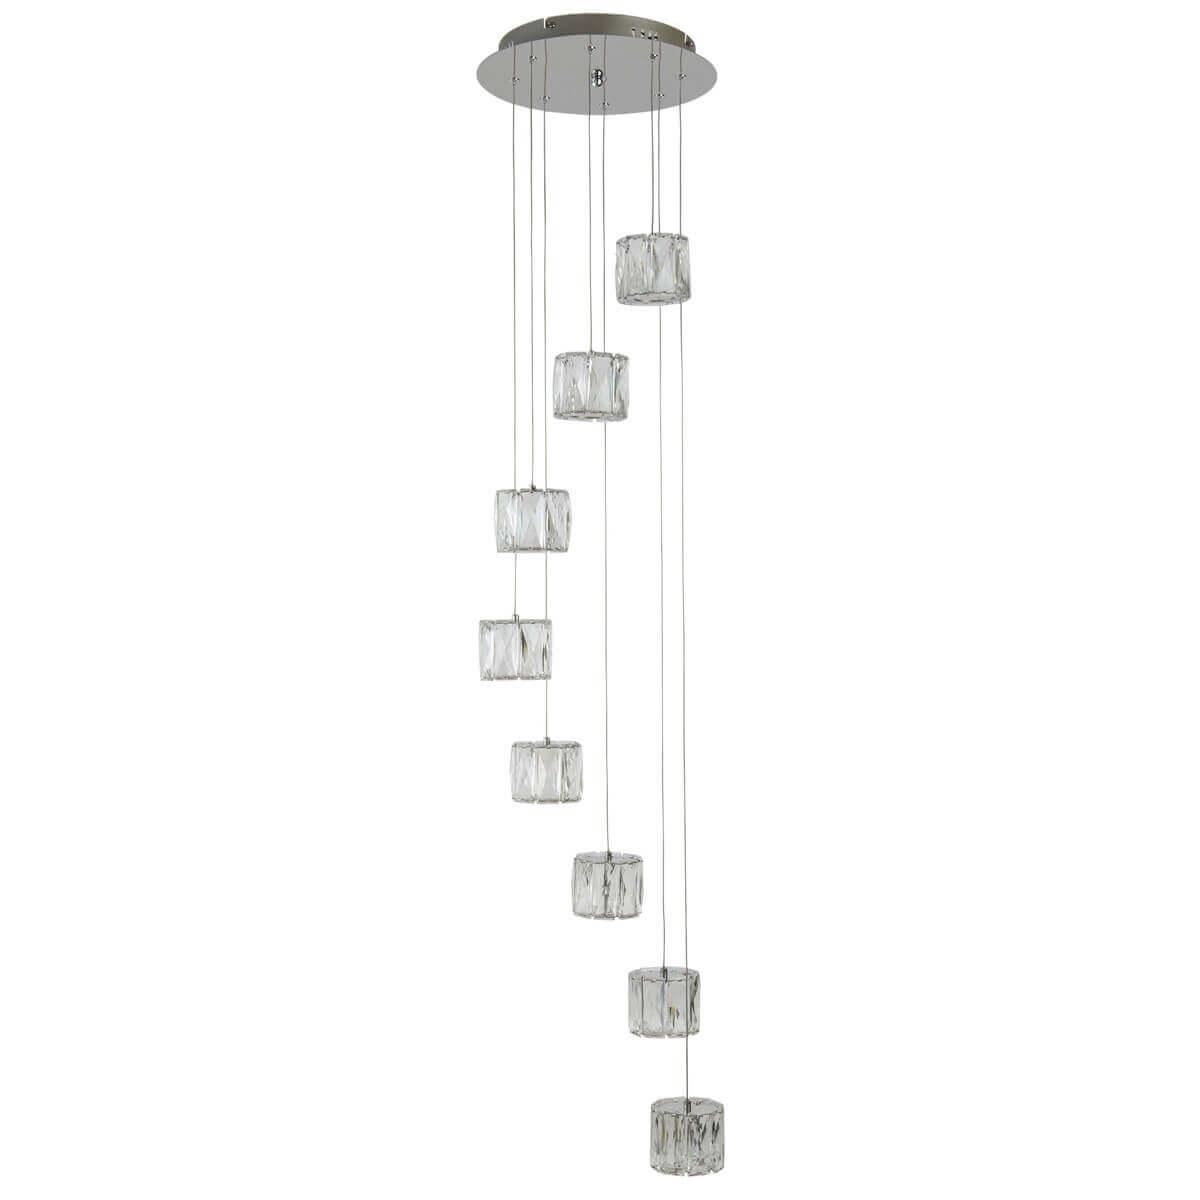 Maxim Led 8 Light Octagon Ceiling Mu Lighti Drop Clear